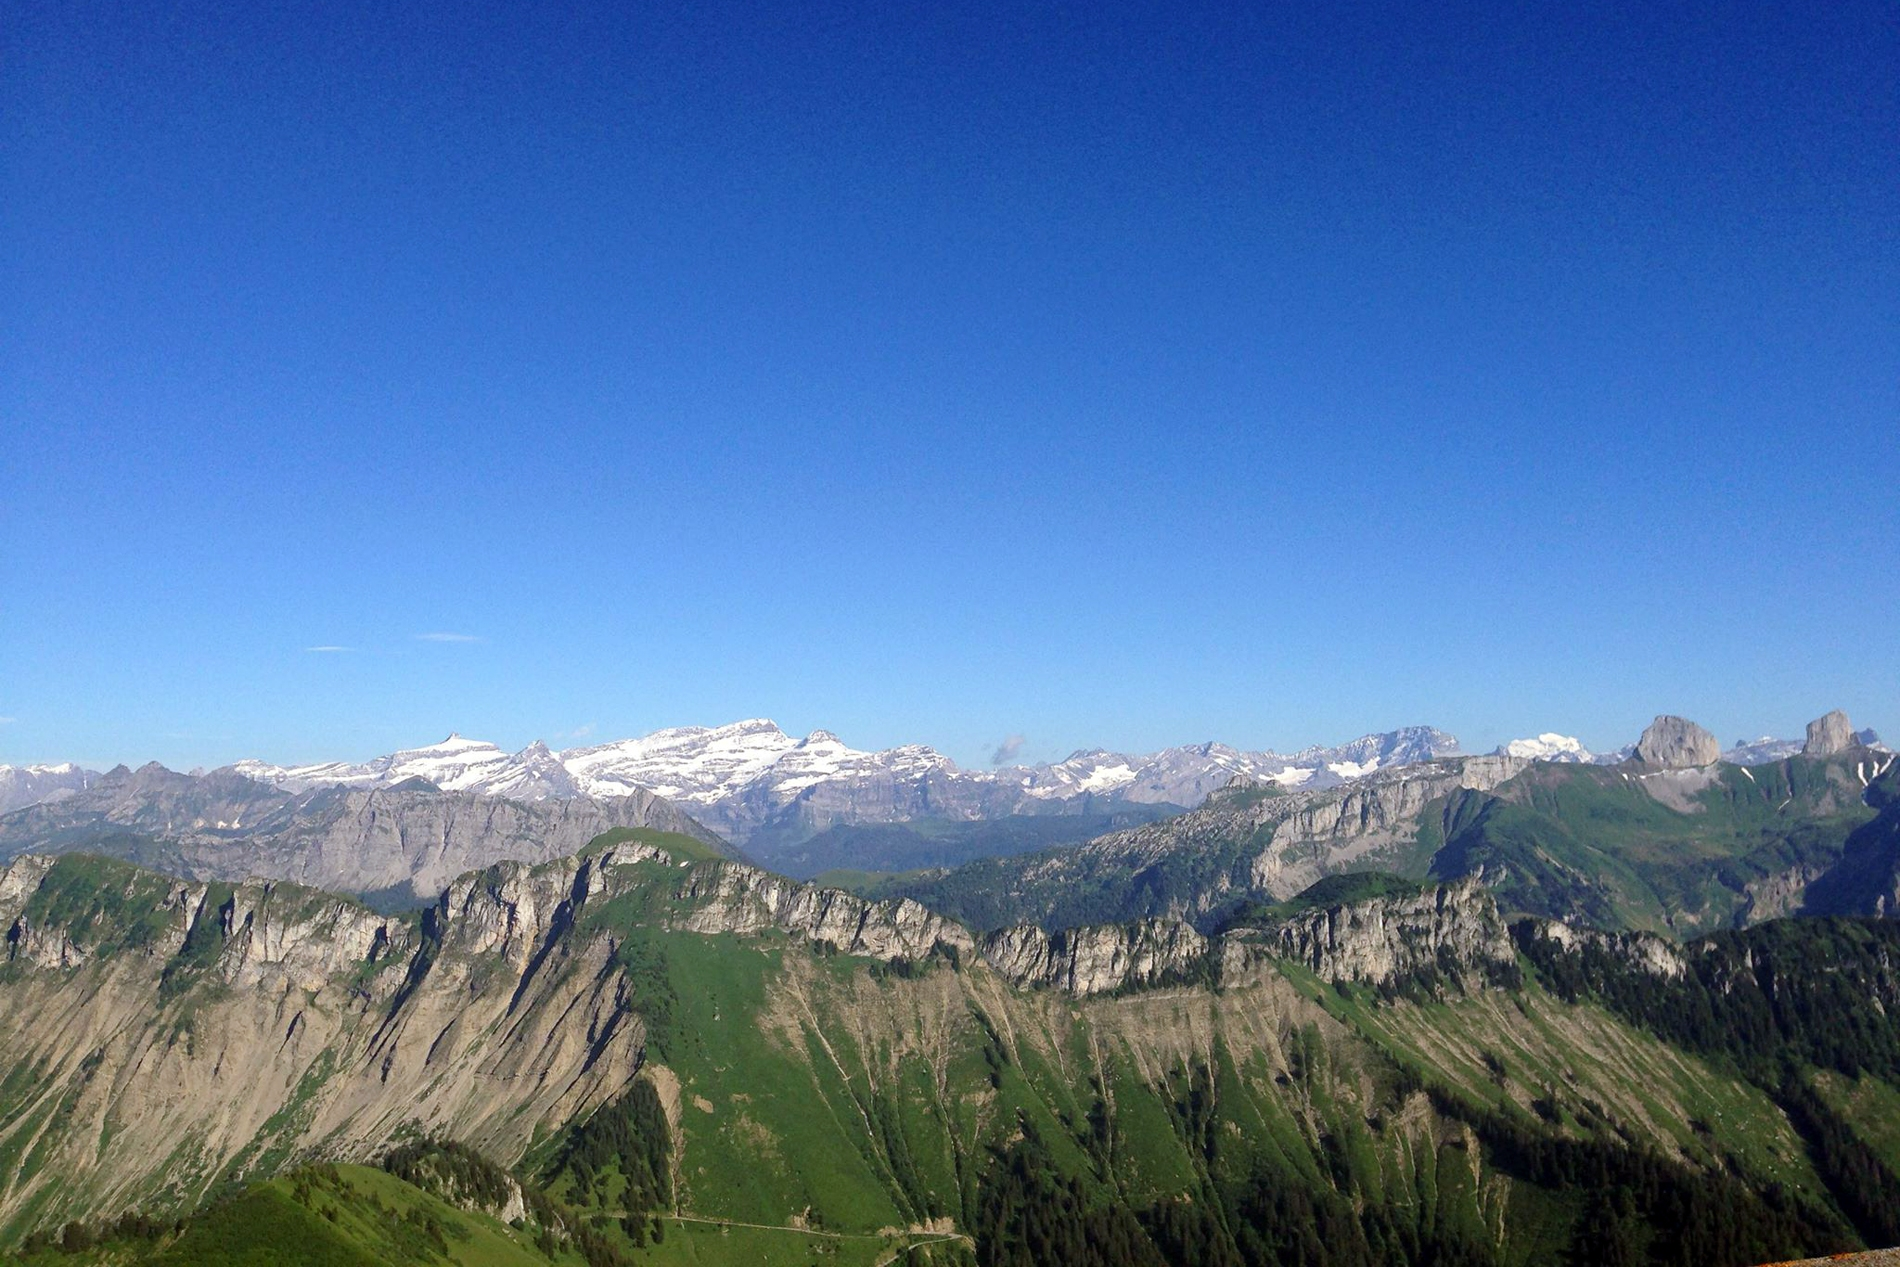 Mountains under a blue sky